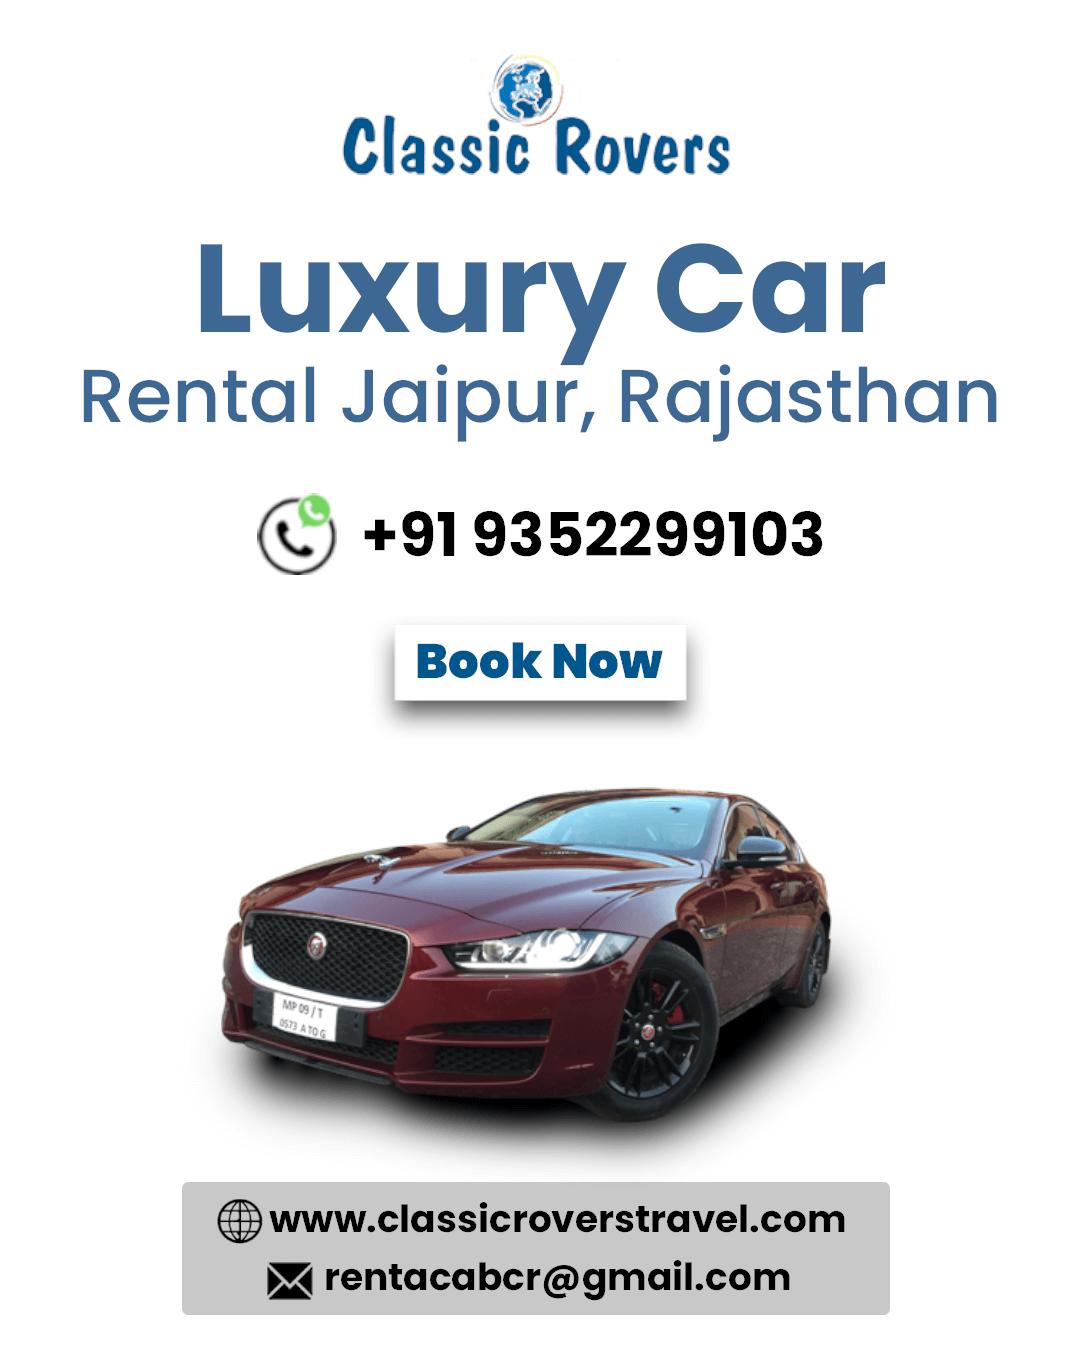 Luxurious Car In Jaipur In 2020 Luxury Car Rental Car Jaipur